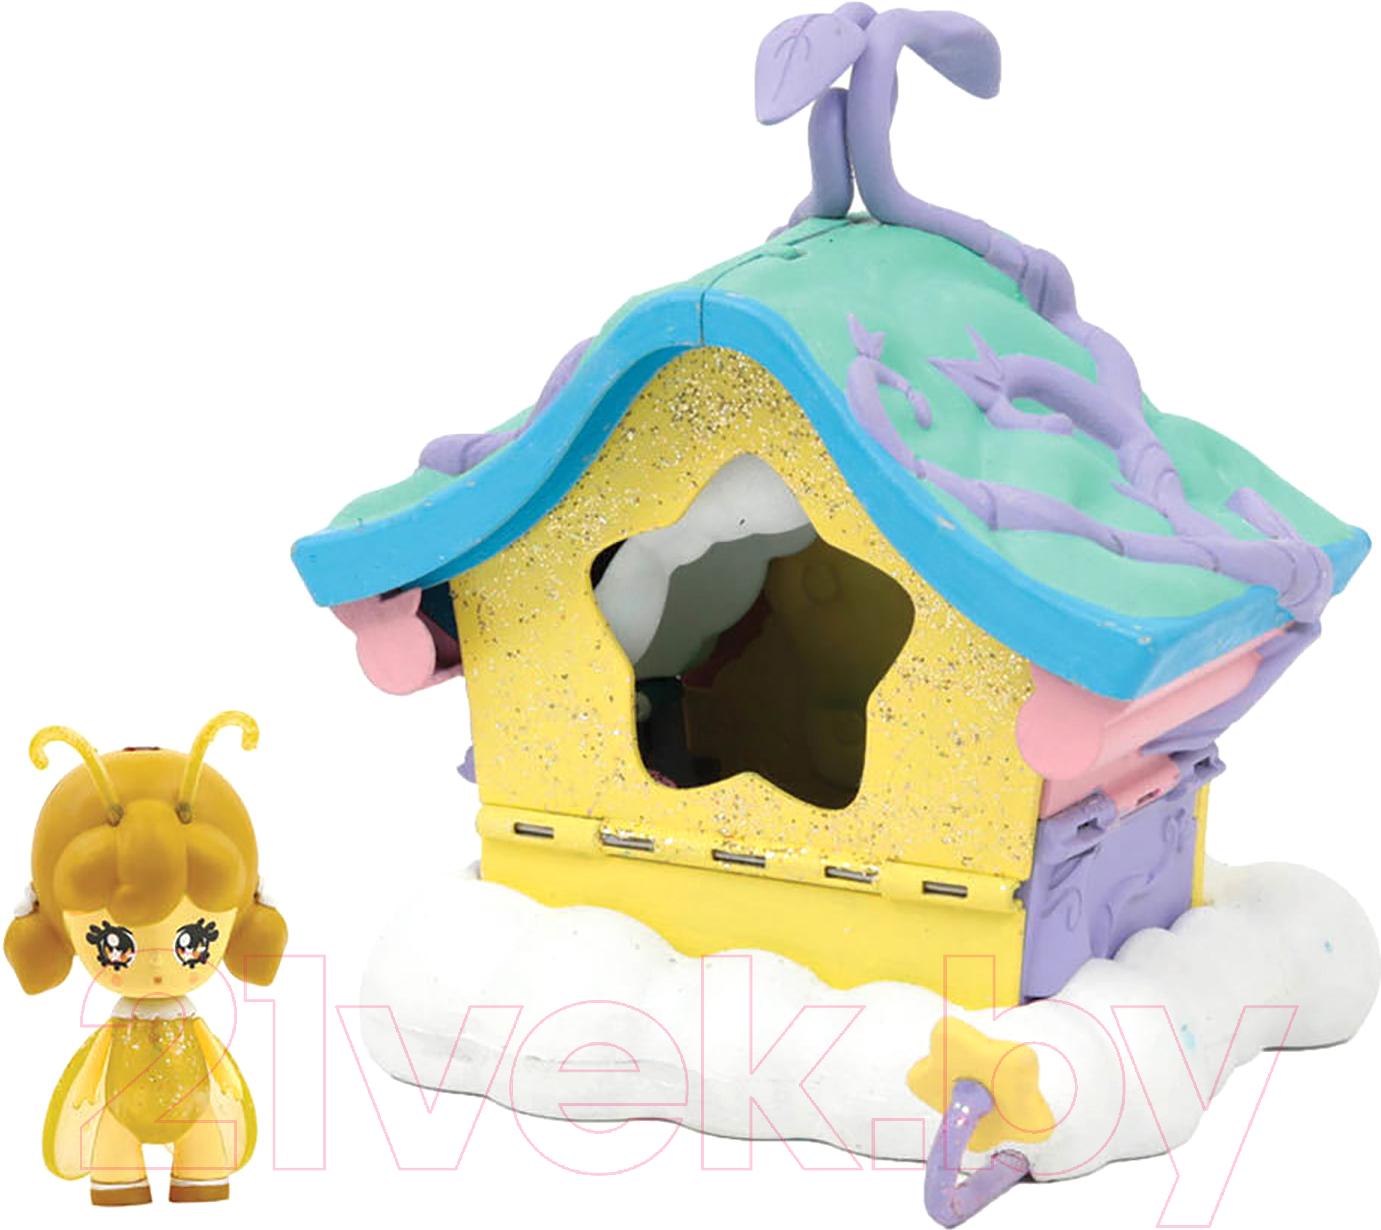 Купить Кукла с аксессуарами Glimmies, Домик Глимтерн / GLM04000, Китай, пластик